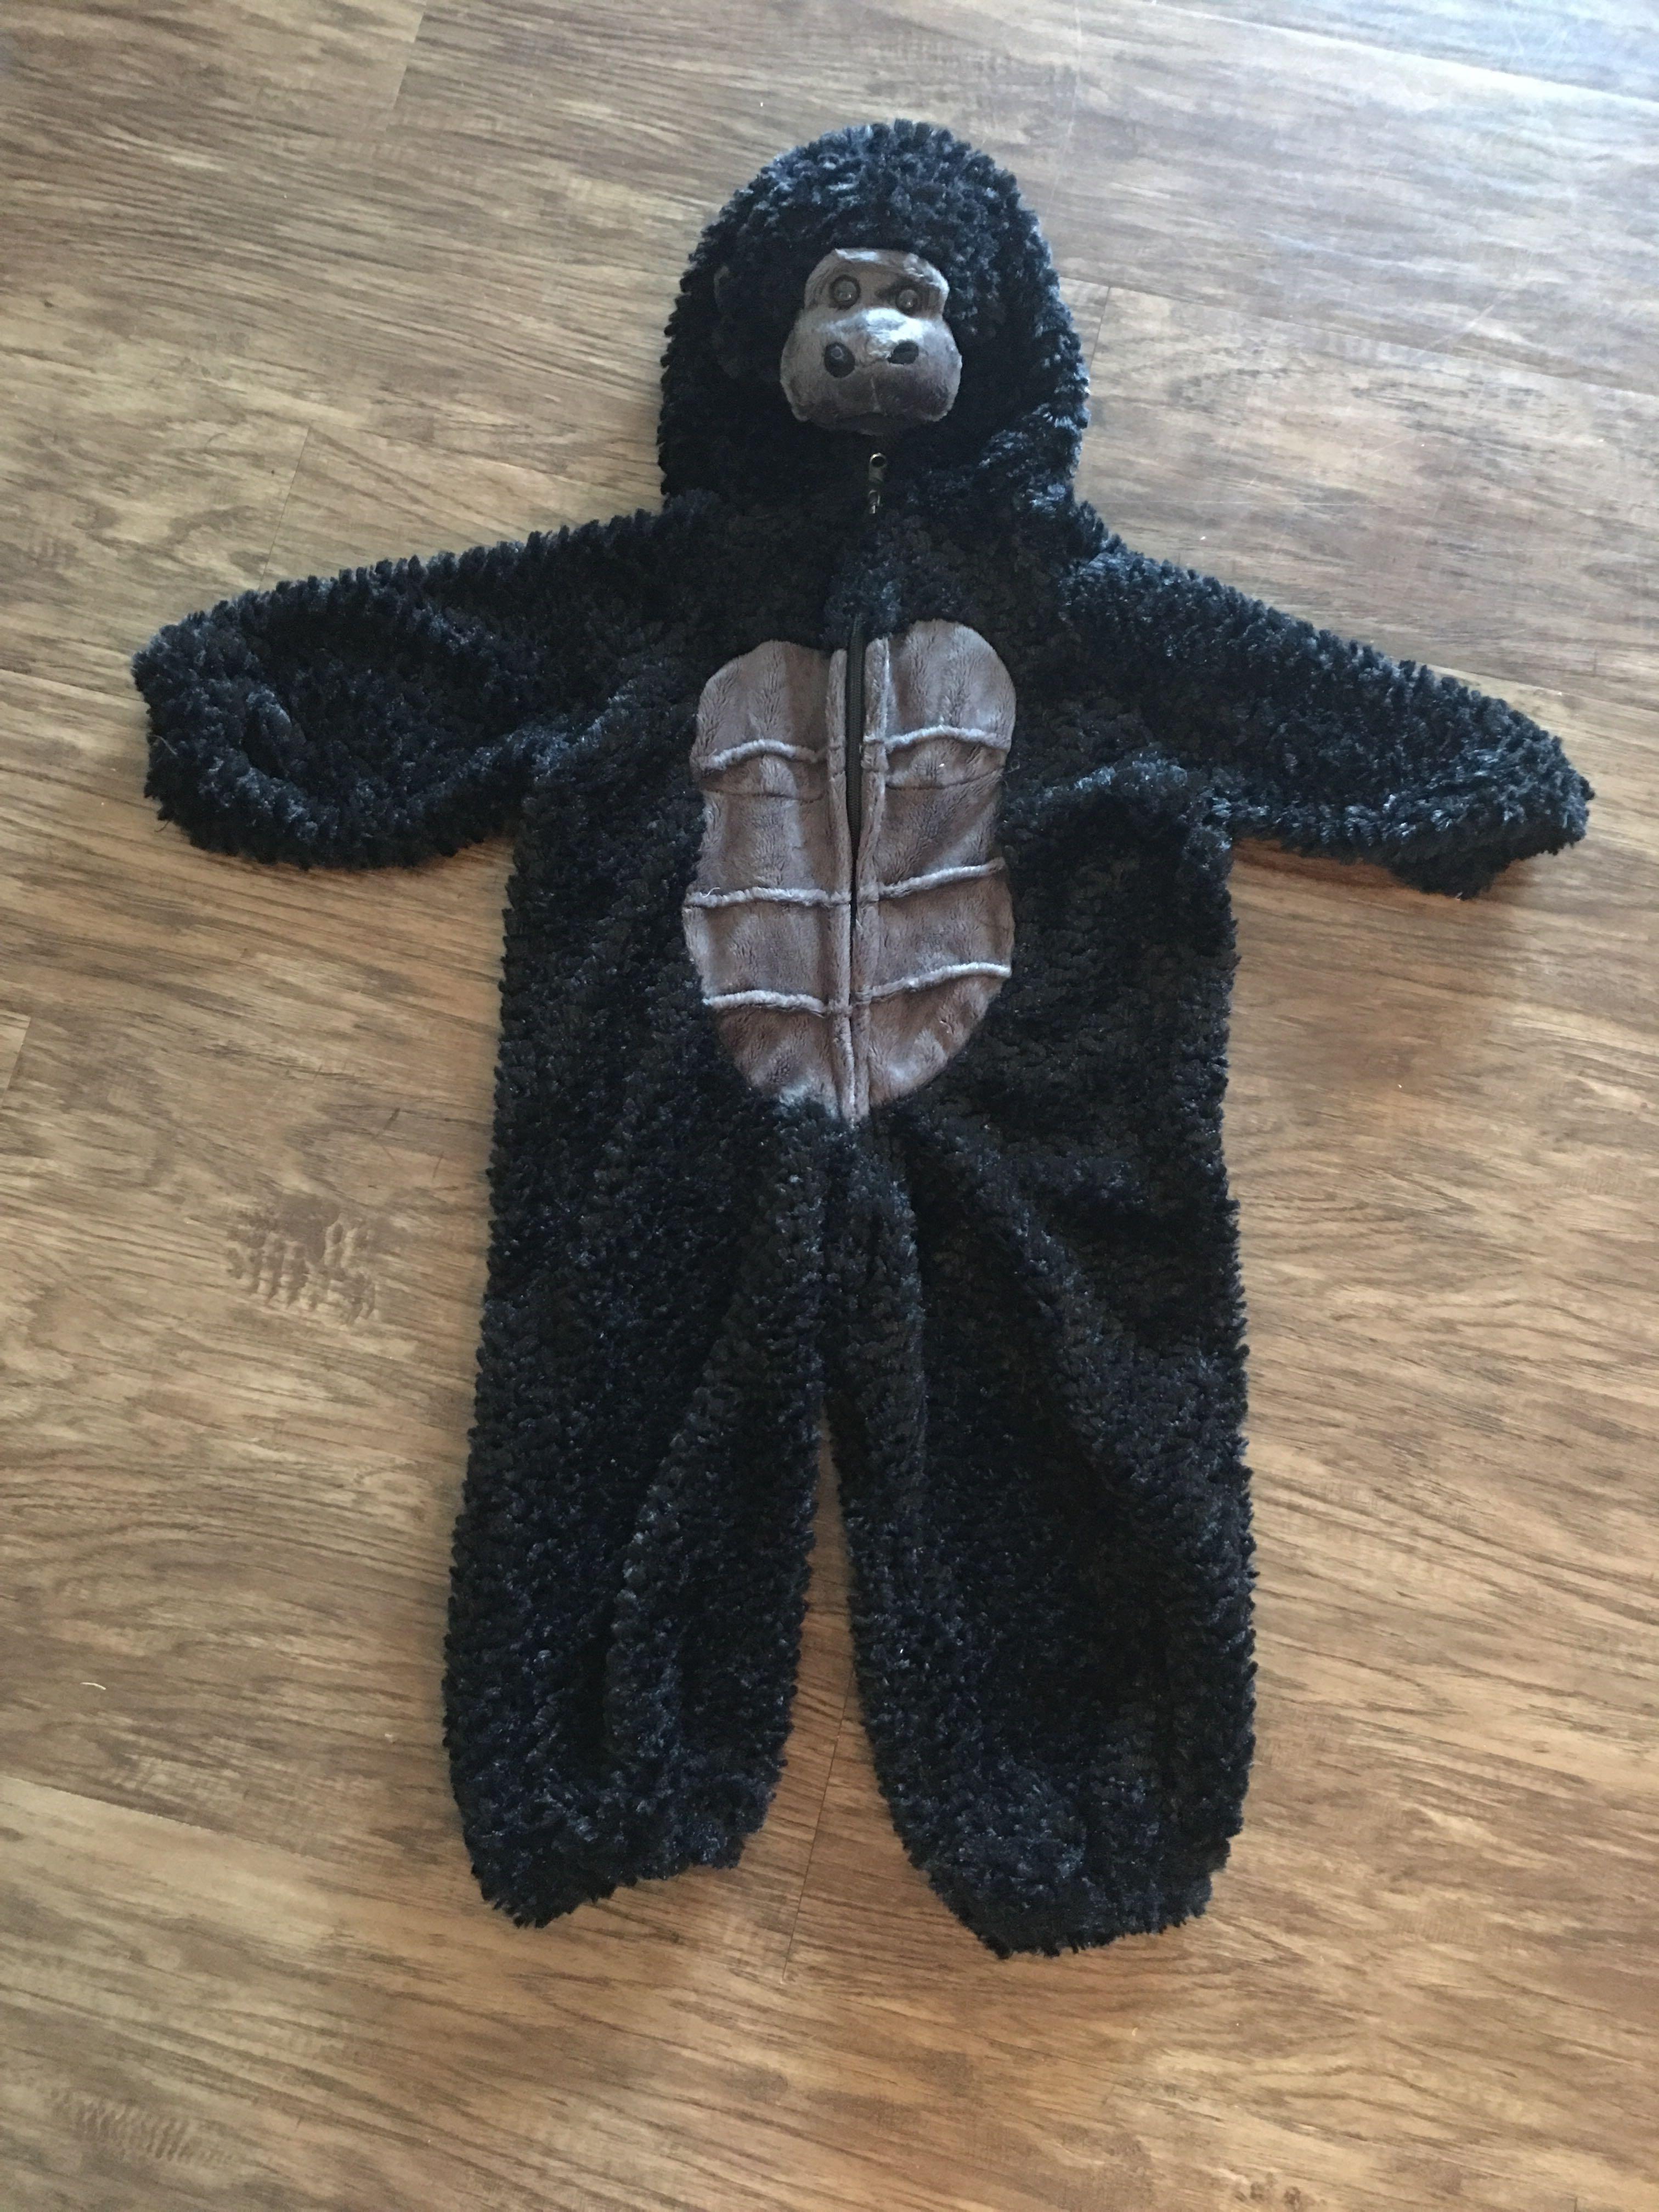 Gorilla Halloween Costumes